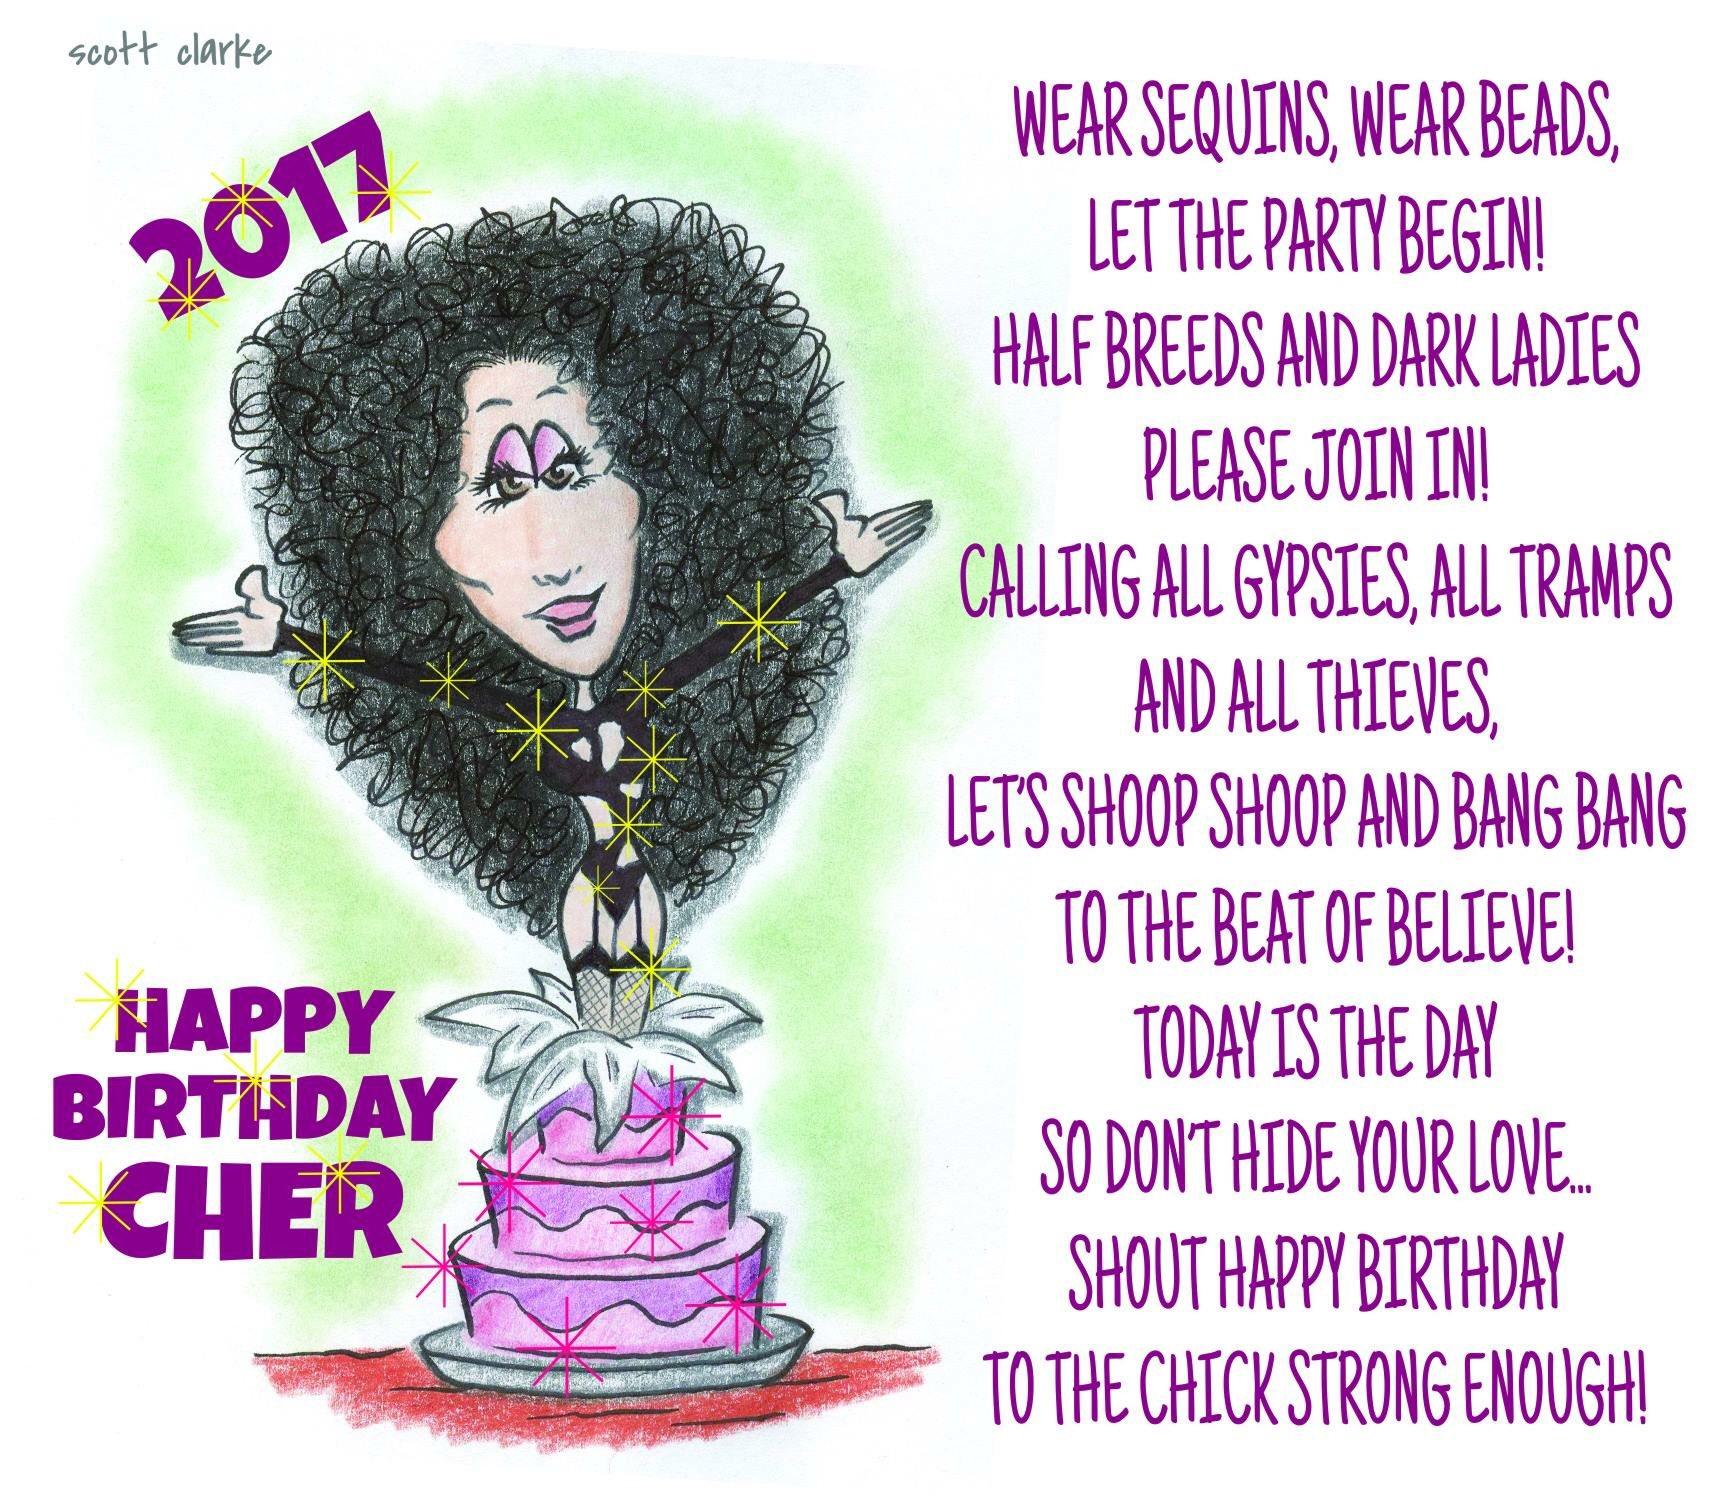 HAPPY BIRTHDAY CHER!!